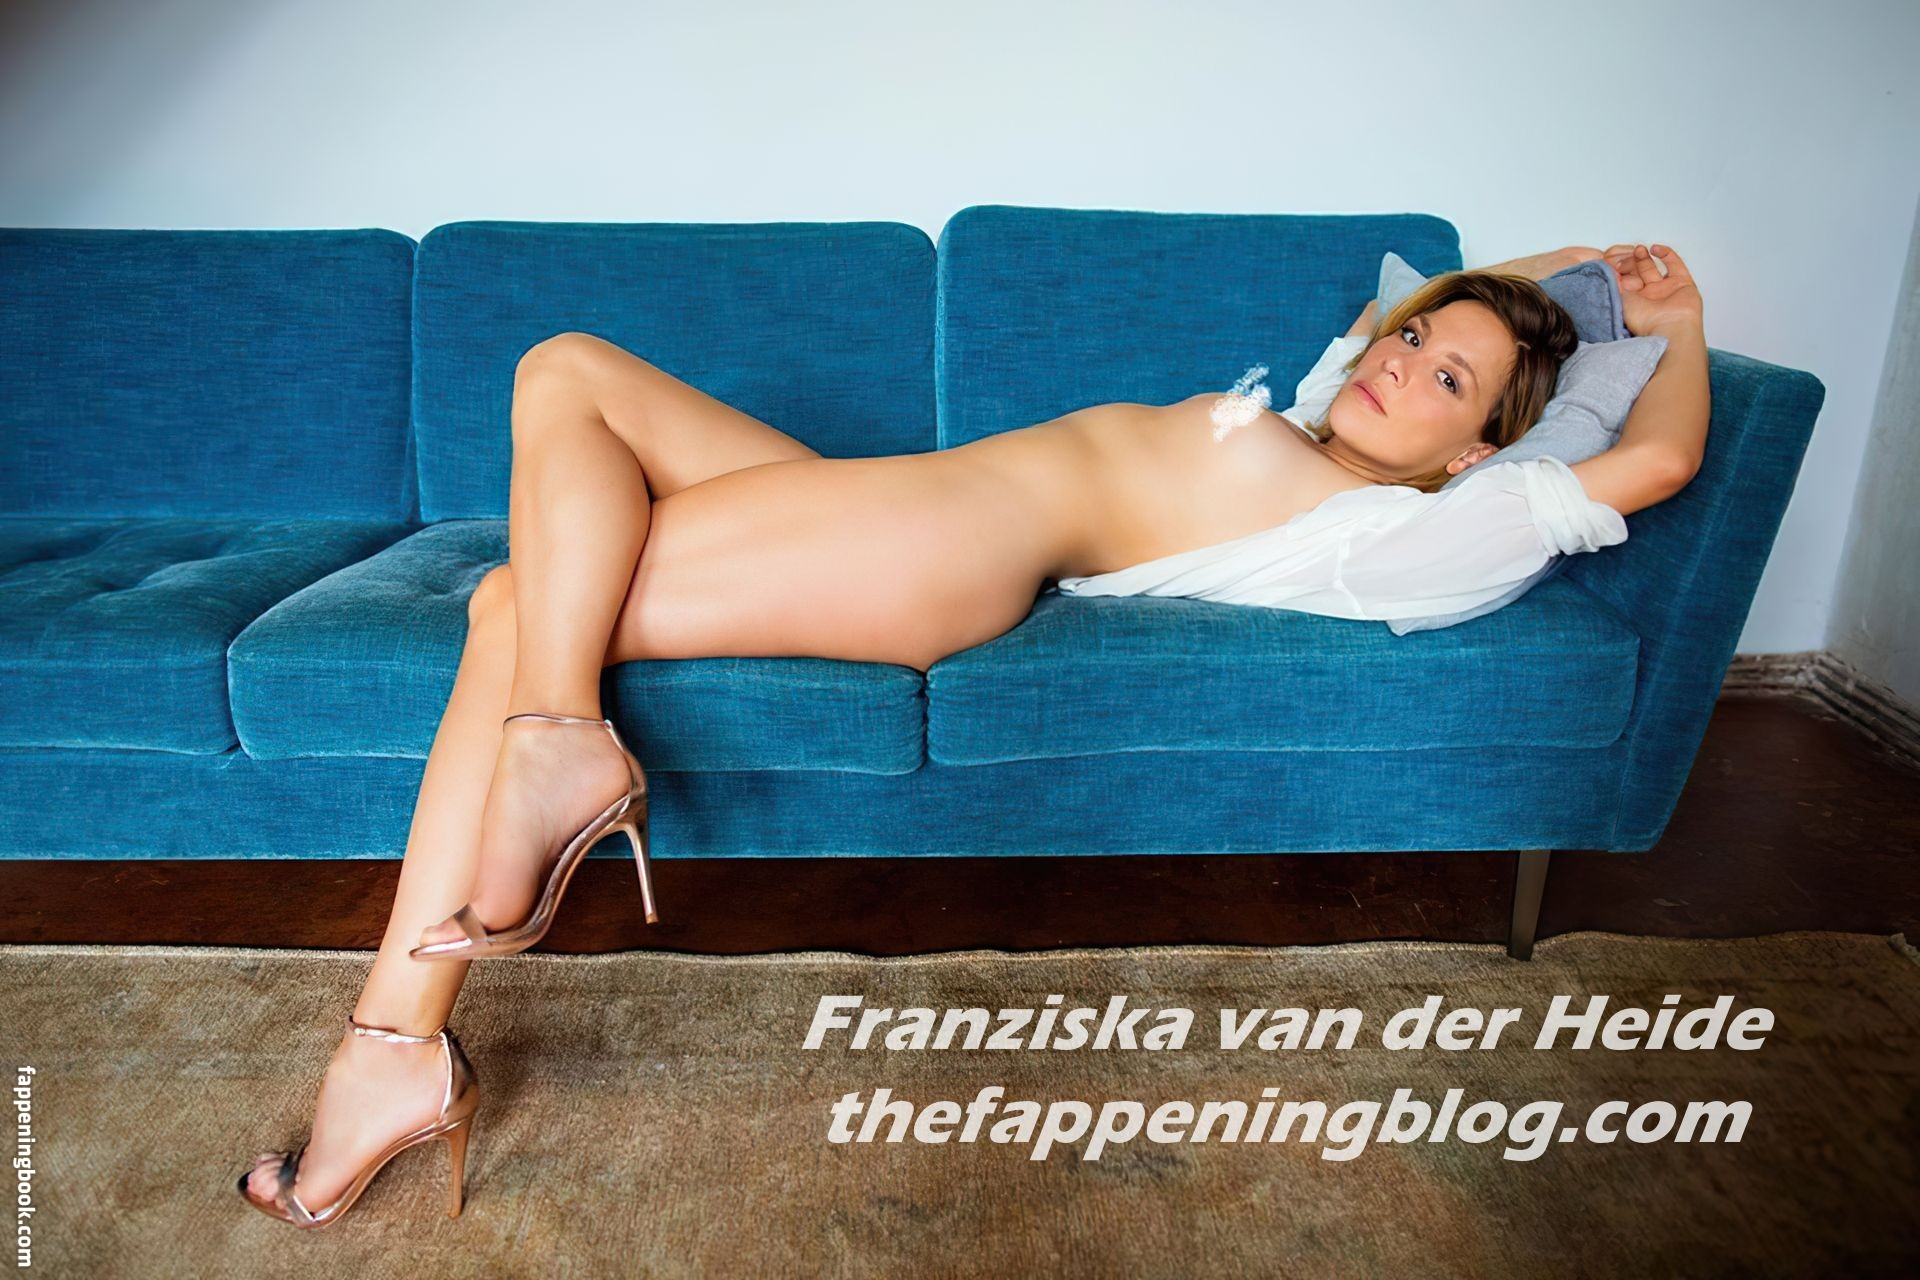 Heide  van der nackt Franziska Franziska van